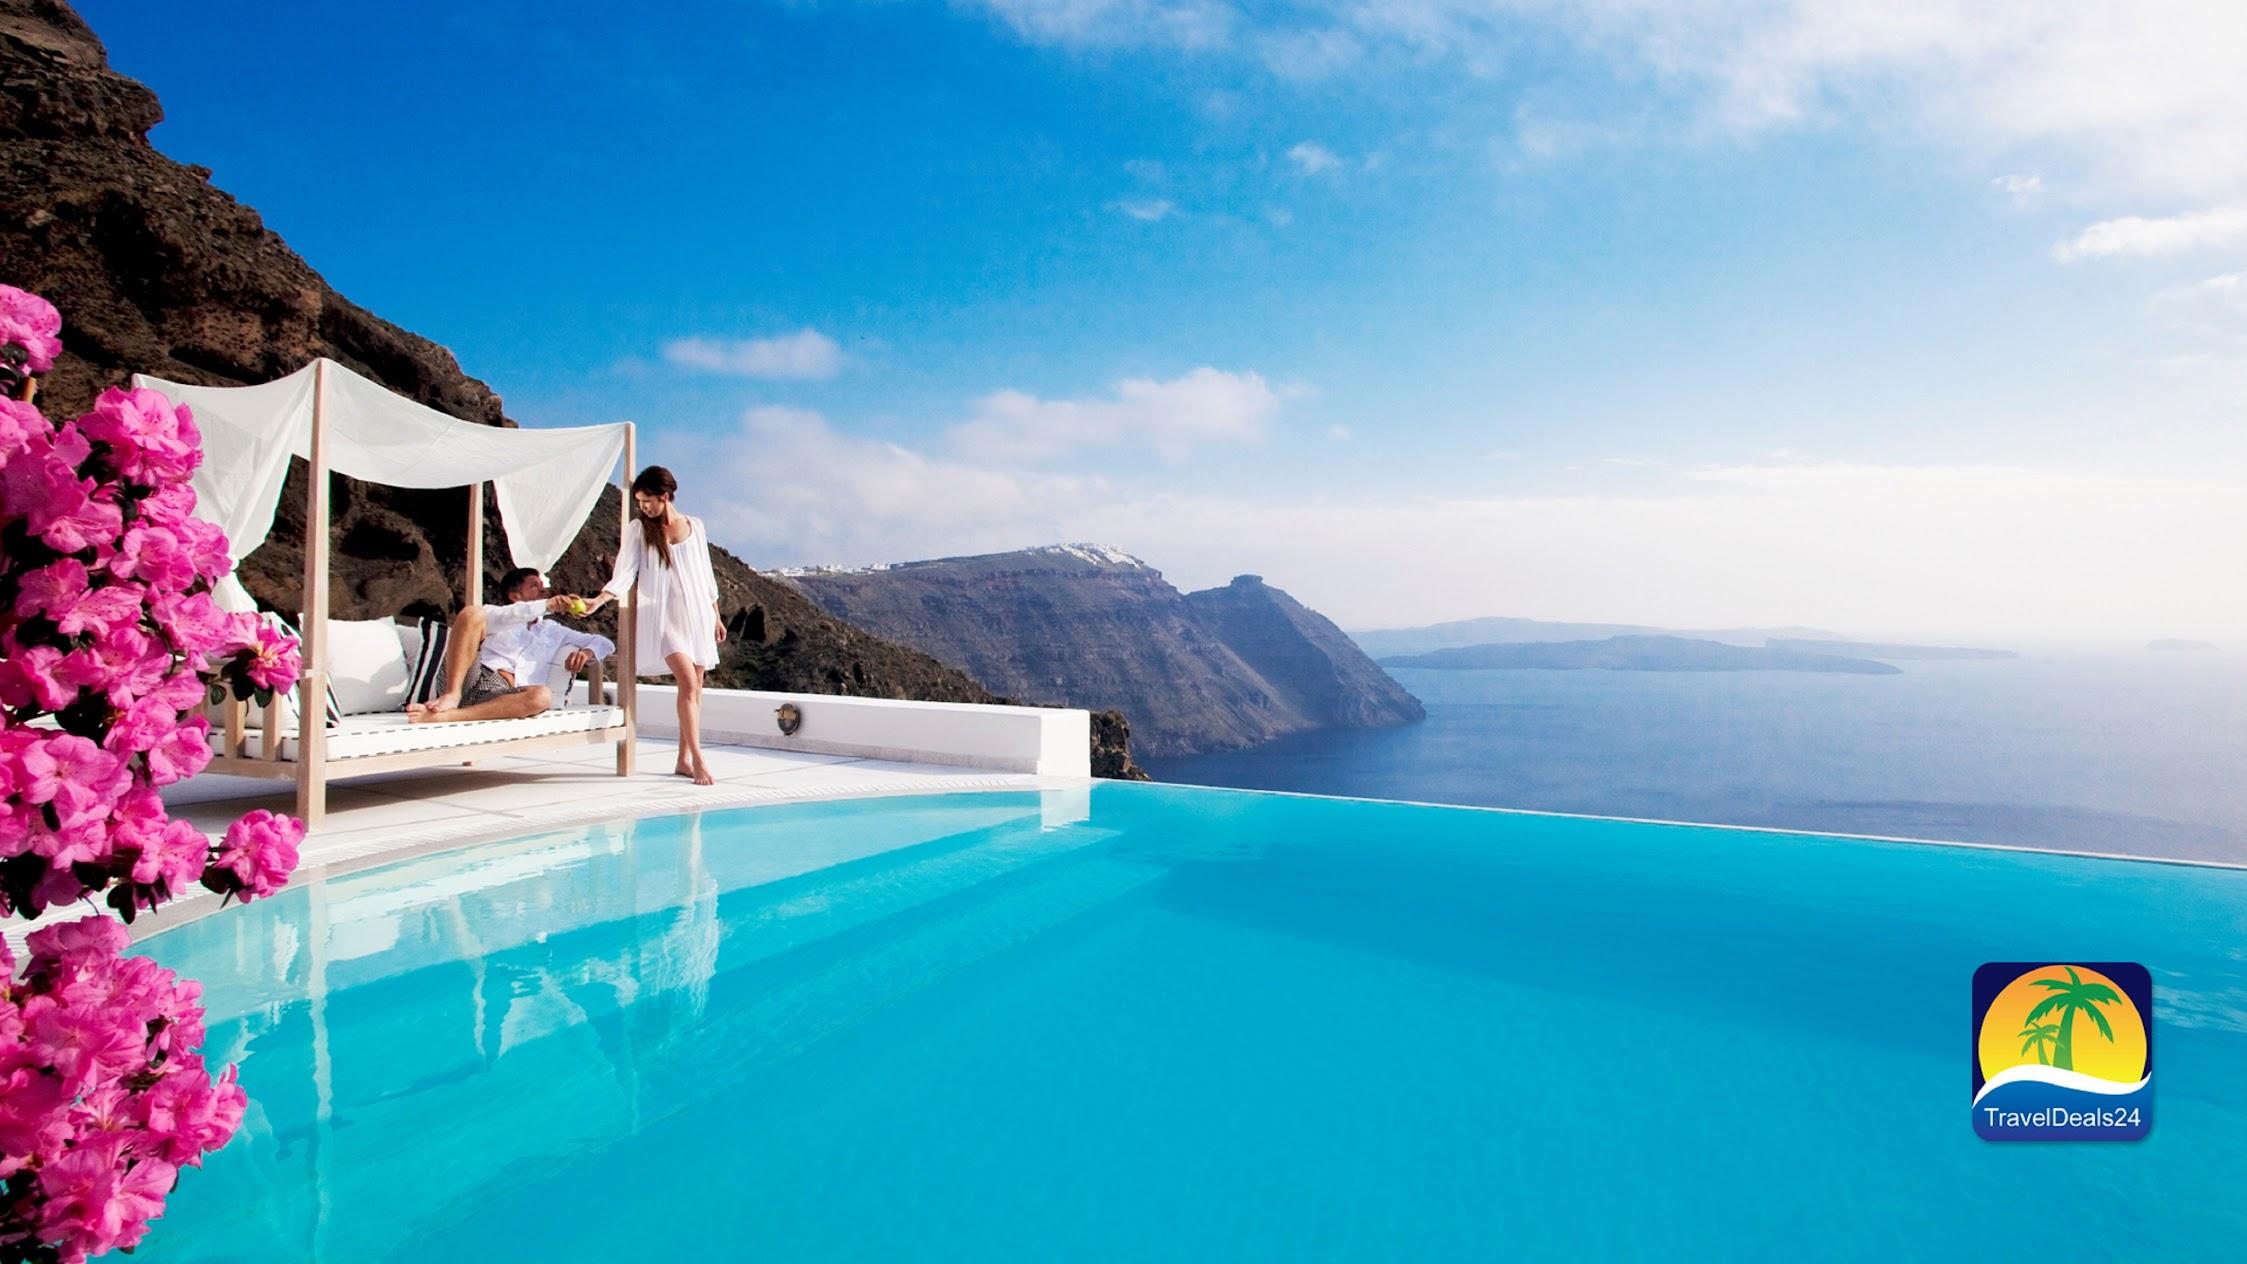 Urlaub, Reisedeals, Reisen + Lastminute Spezialist